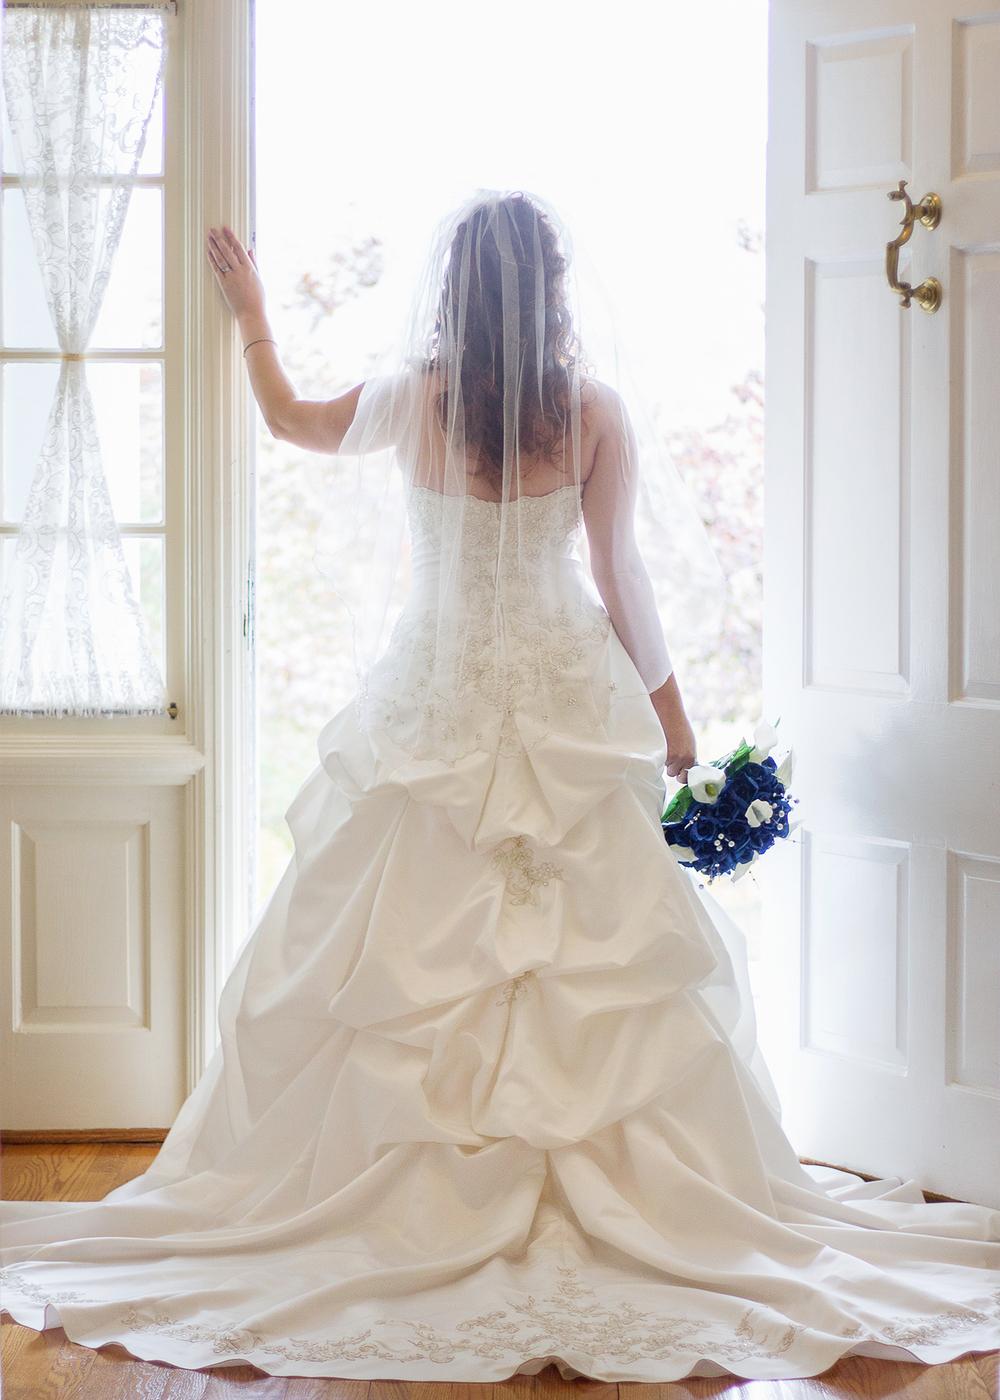 Favorite Bridal Shot, Alleghany Wedding Photographer